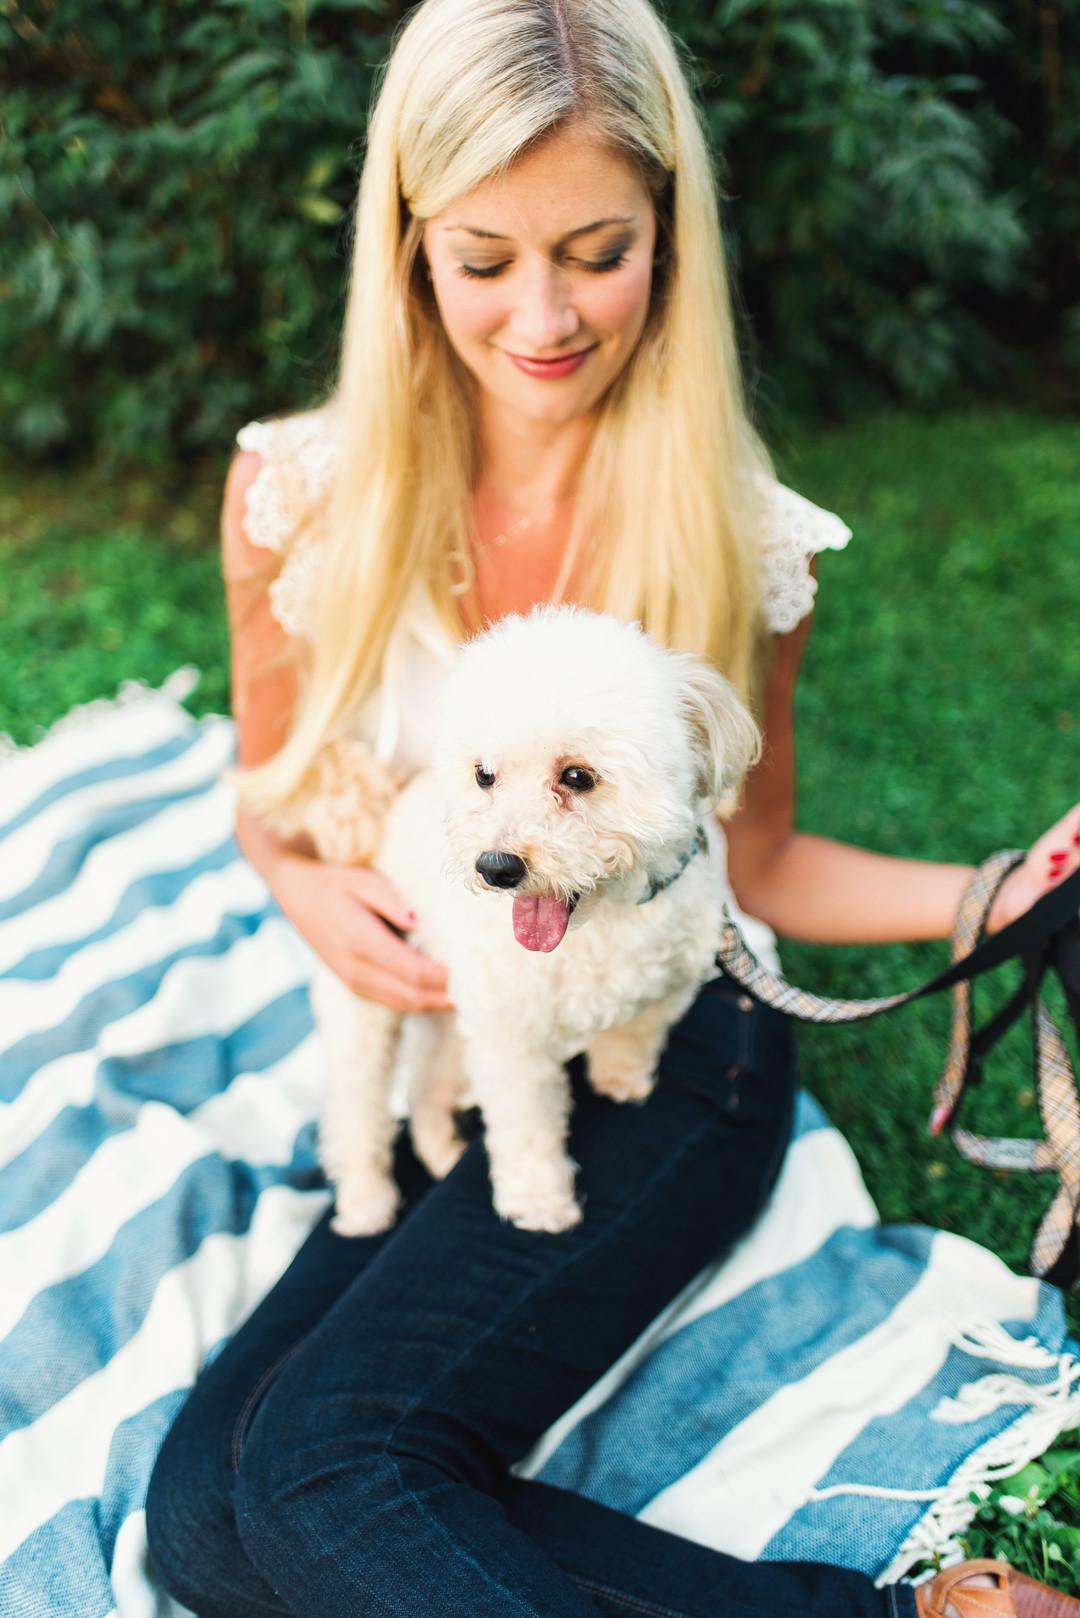 Chicago Engagement Photoshoot with Dog Cody Krogman Photography